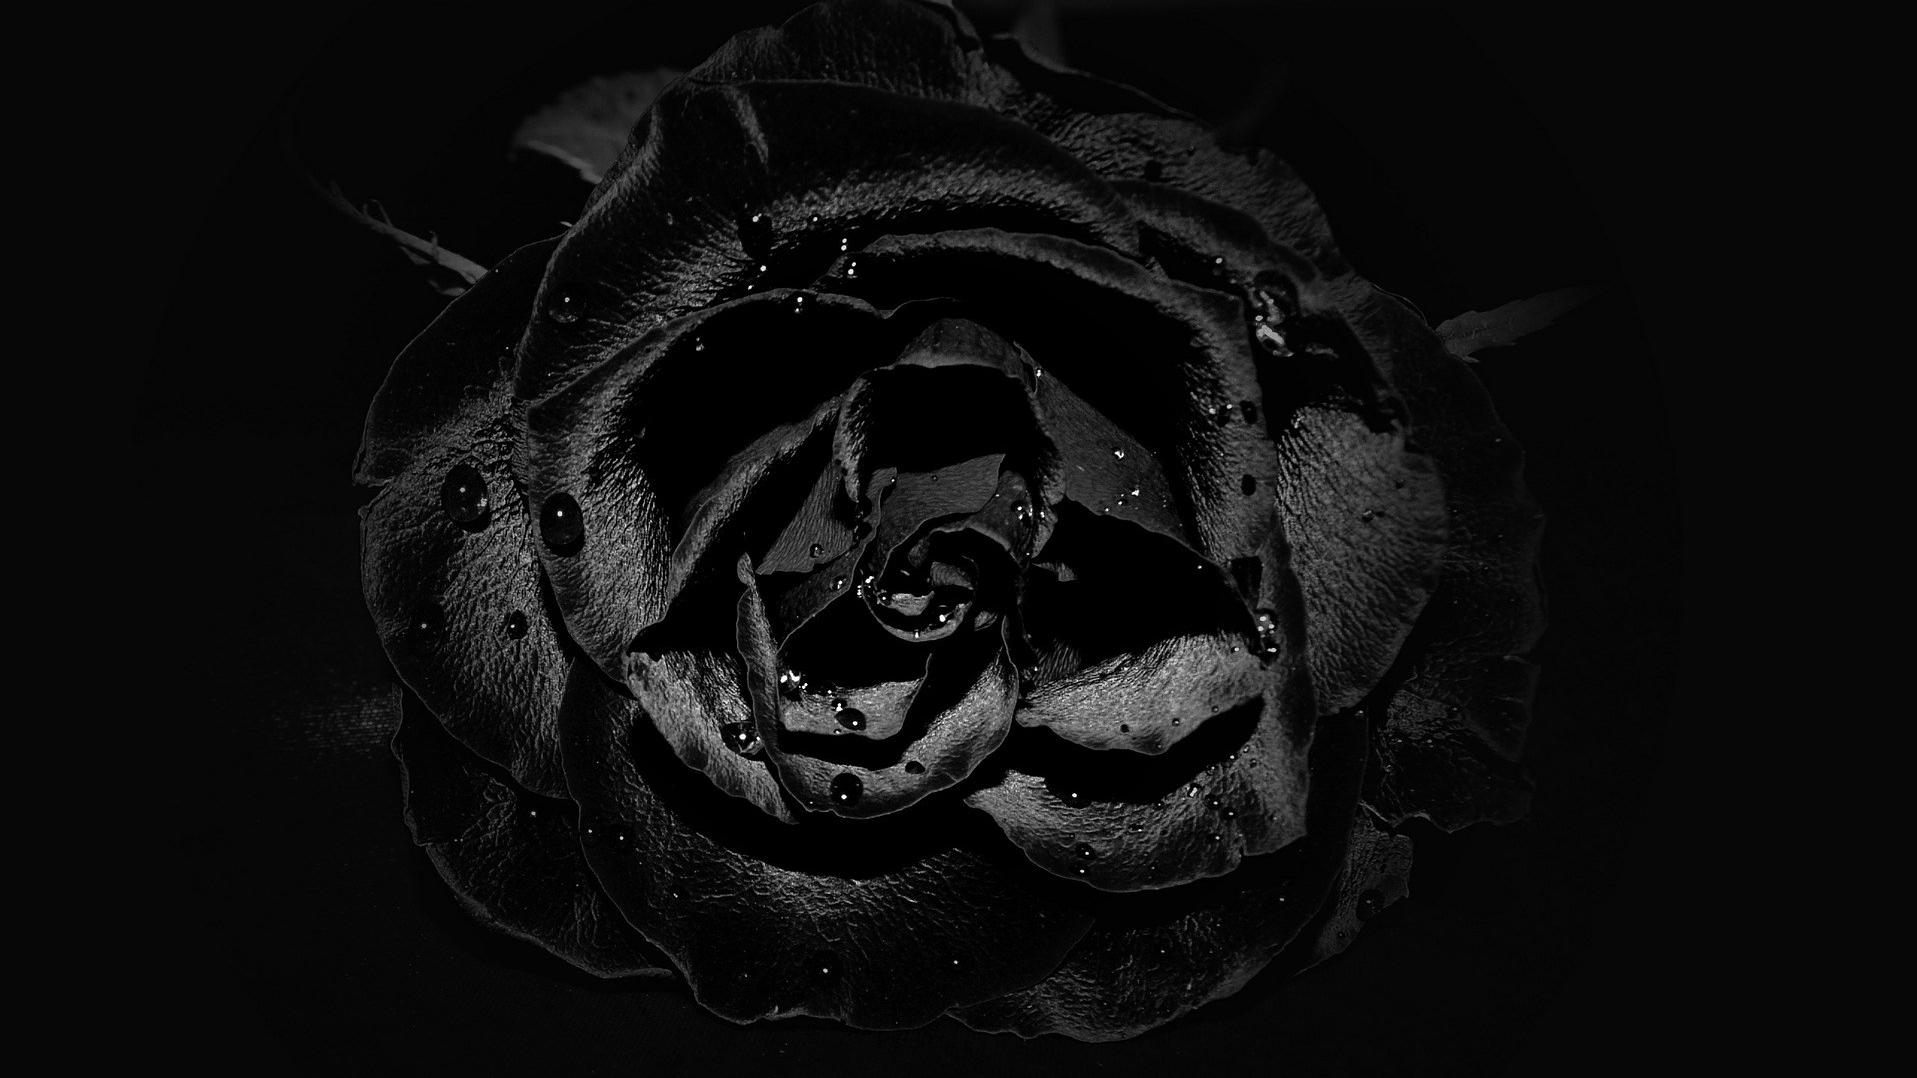 rose-607914_1920.jpg